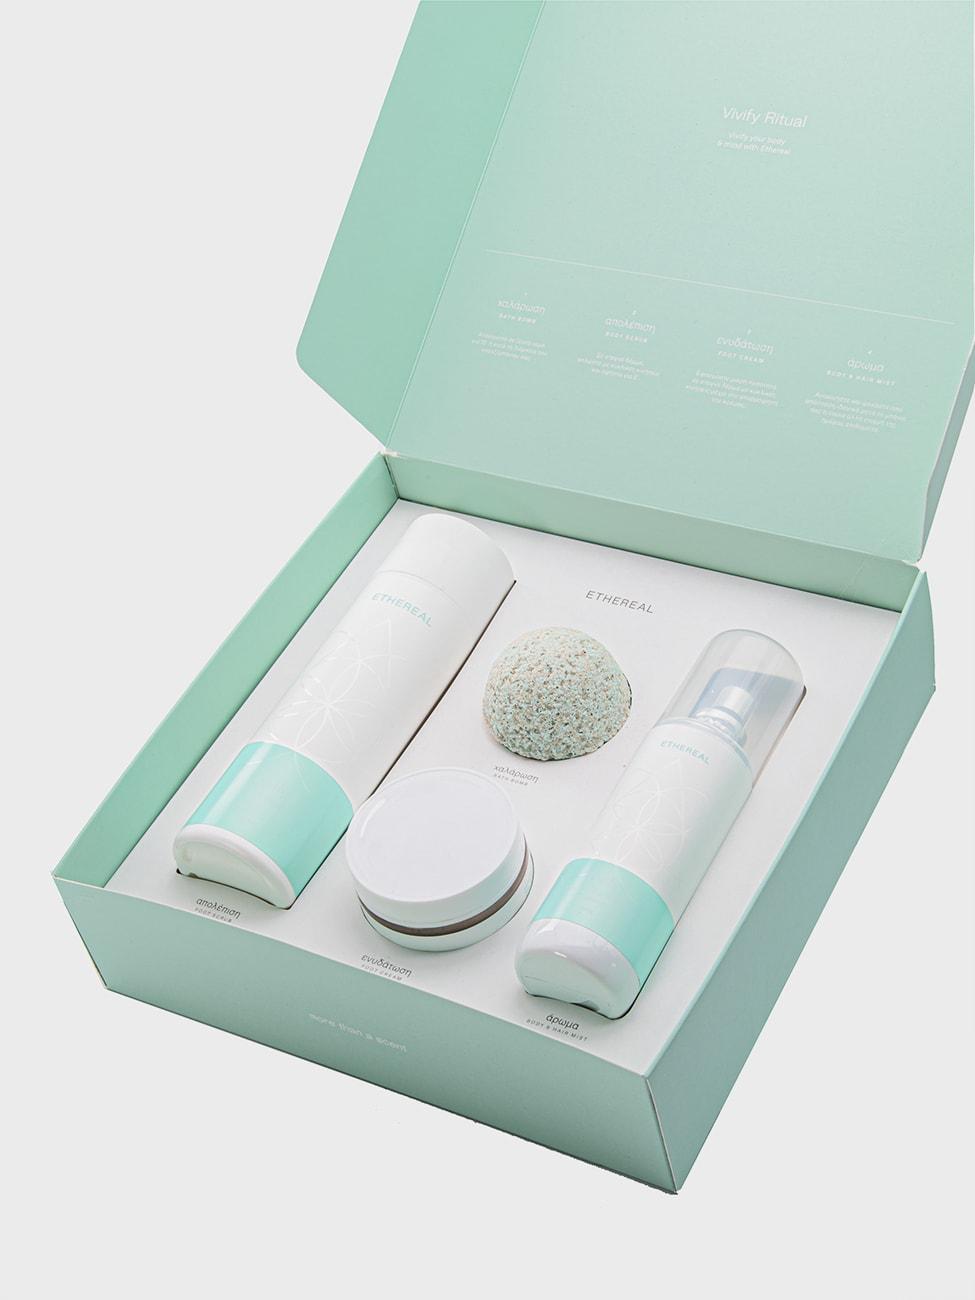 Vivify_Bundle_Open_Ethereal_Dermocosmetics_Skincare_Handmade_Greek_Products